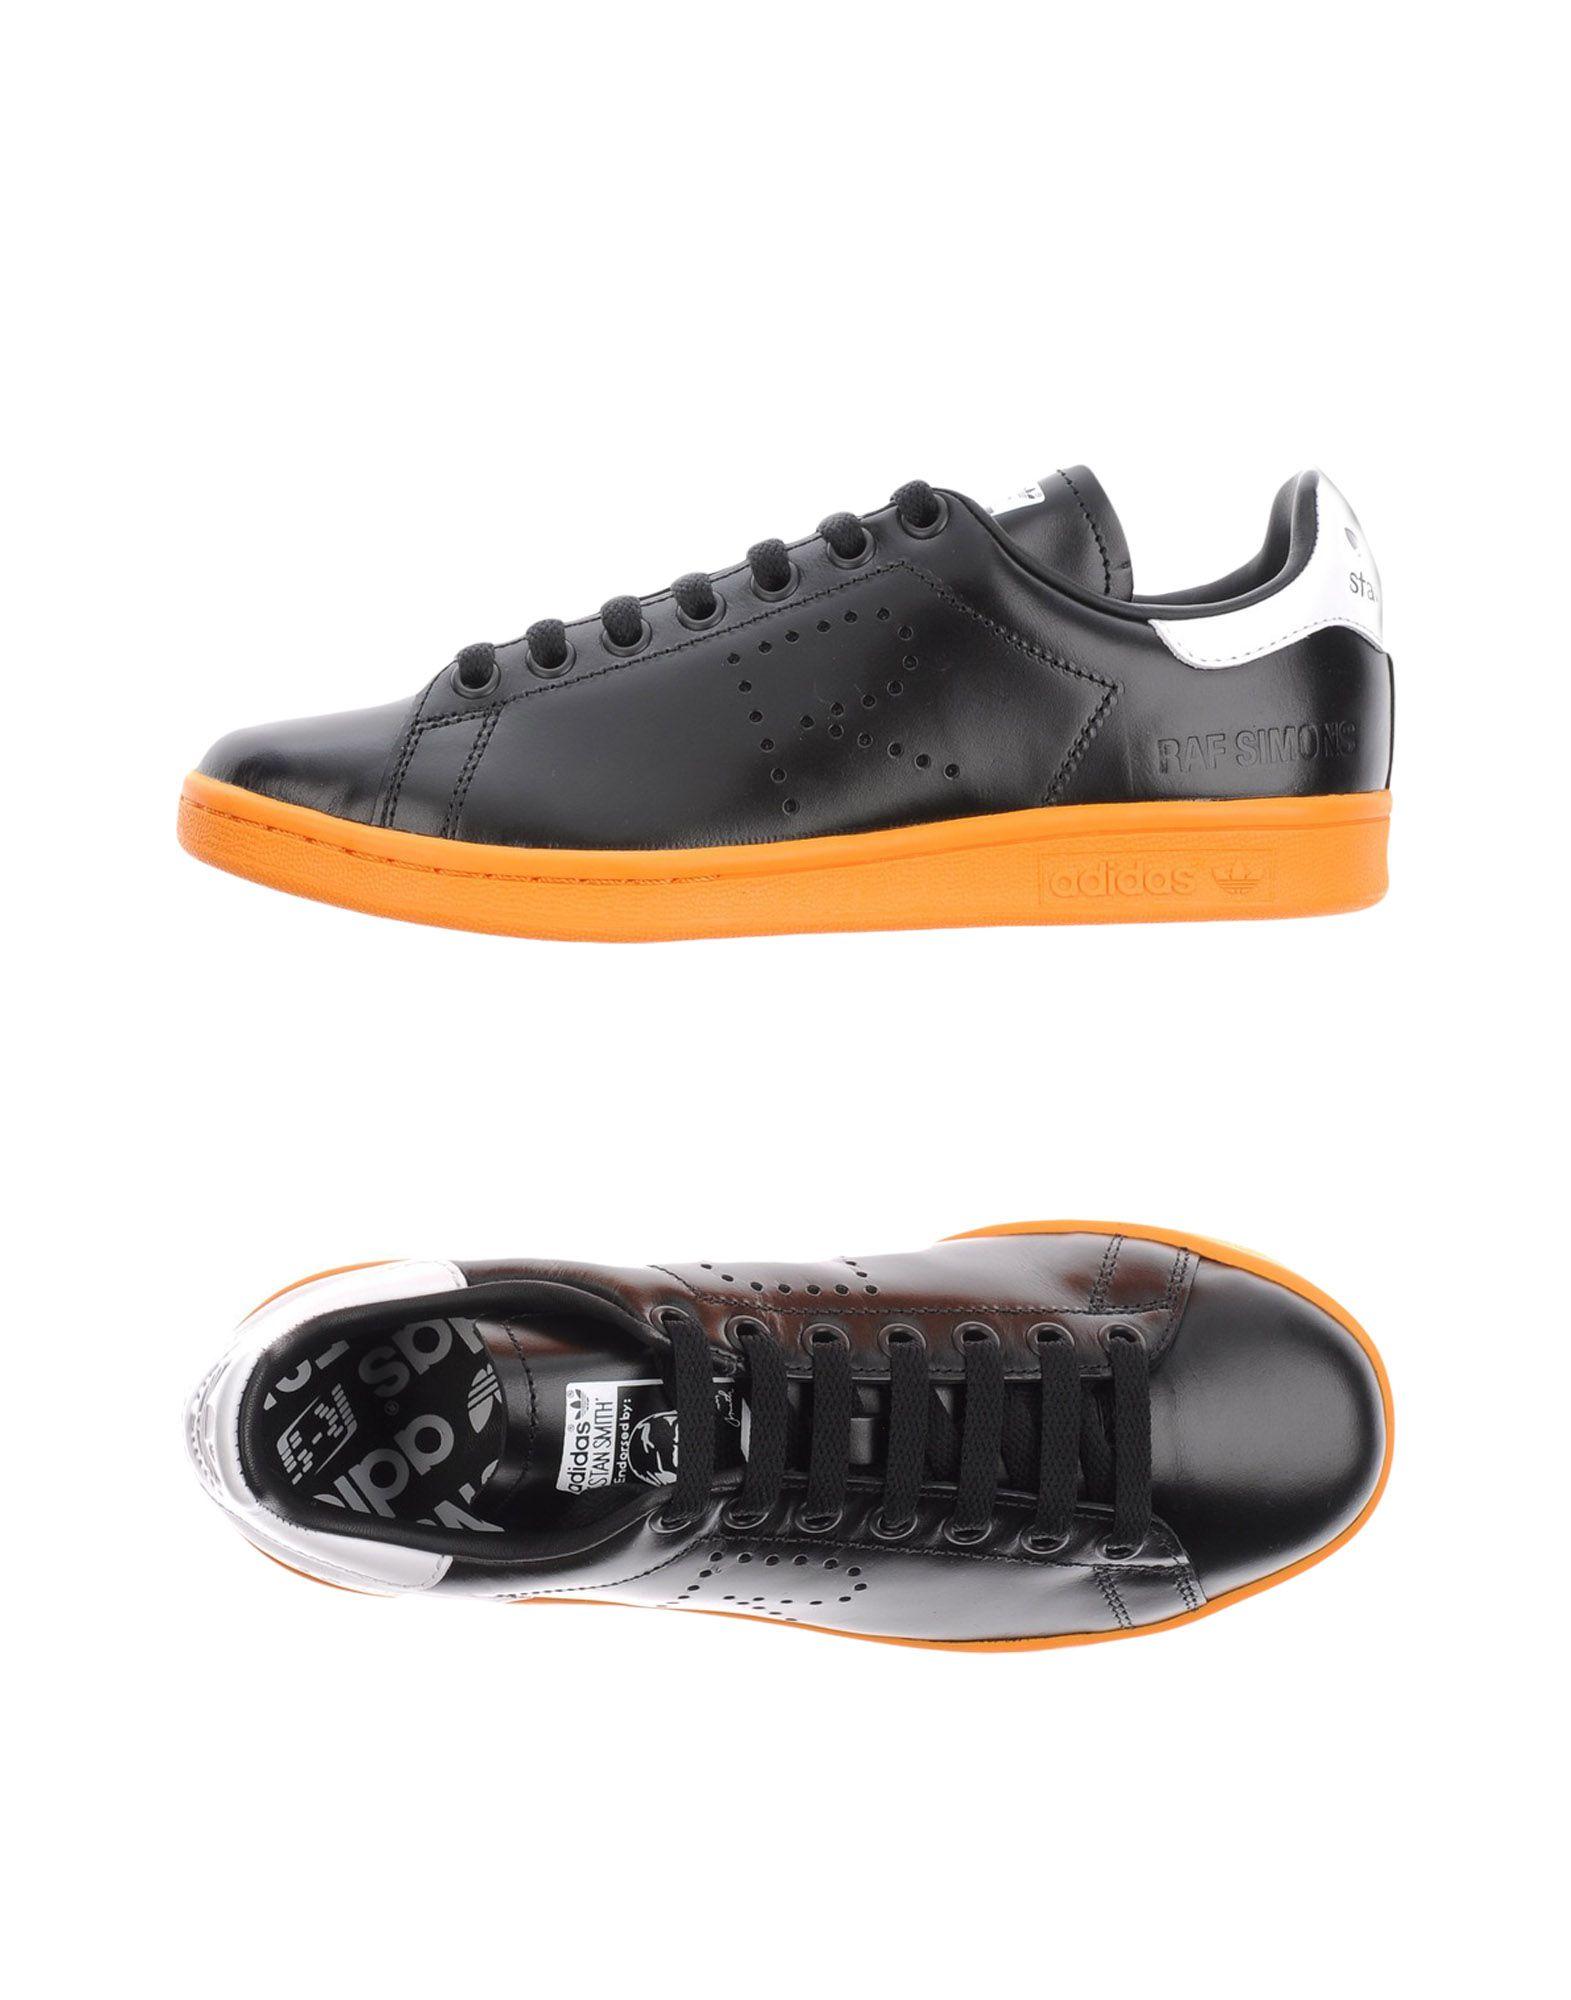 Stilvolle billige Schuhe Adidas By Raf Simons Sneakers Damen  11236433RS